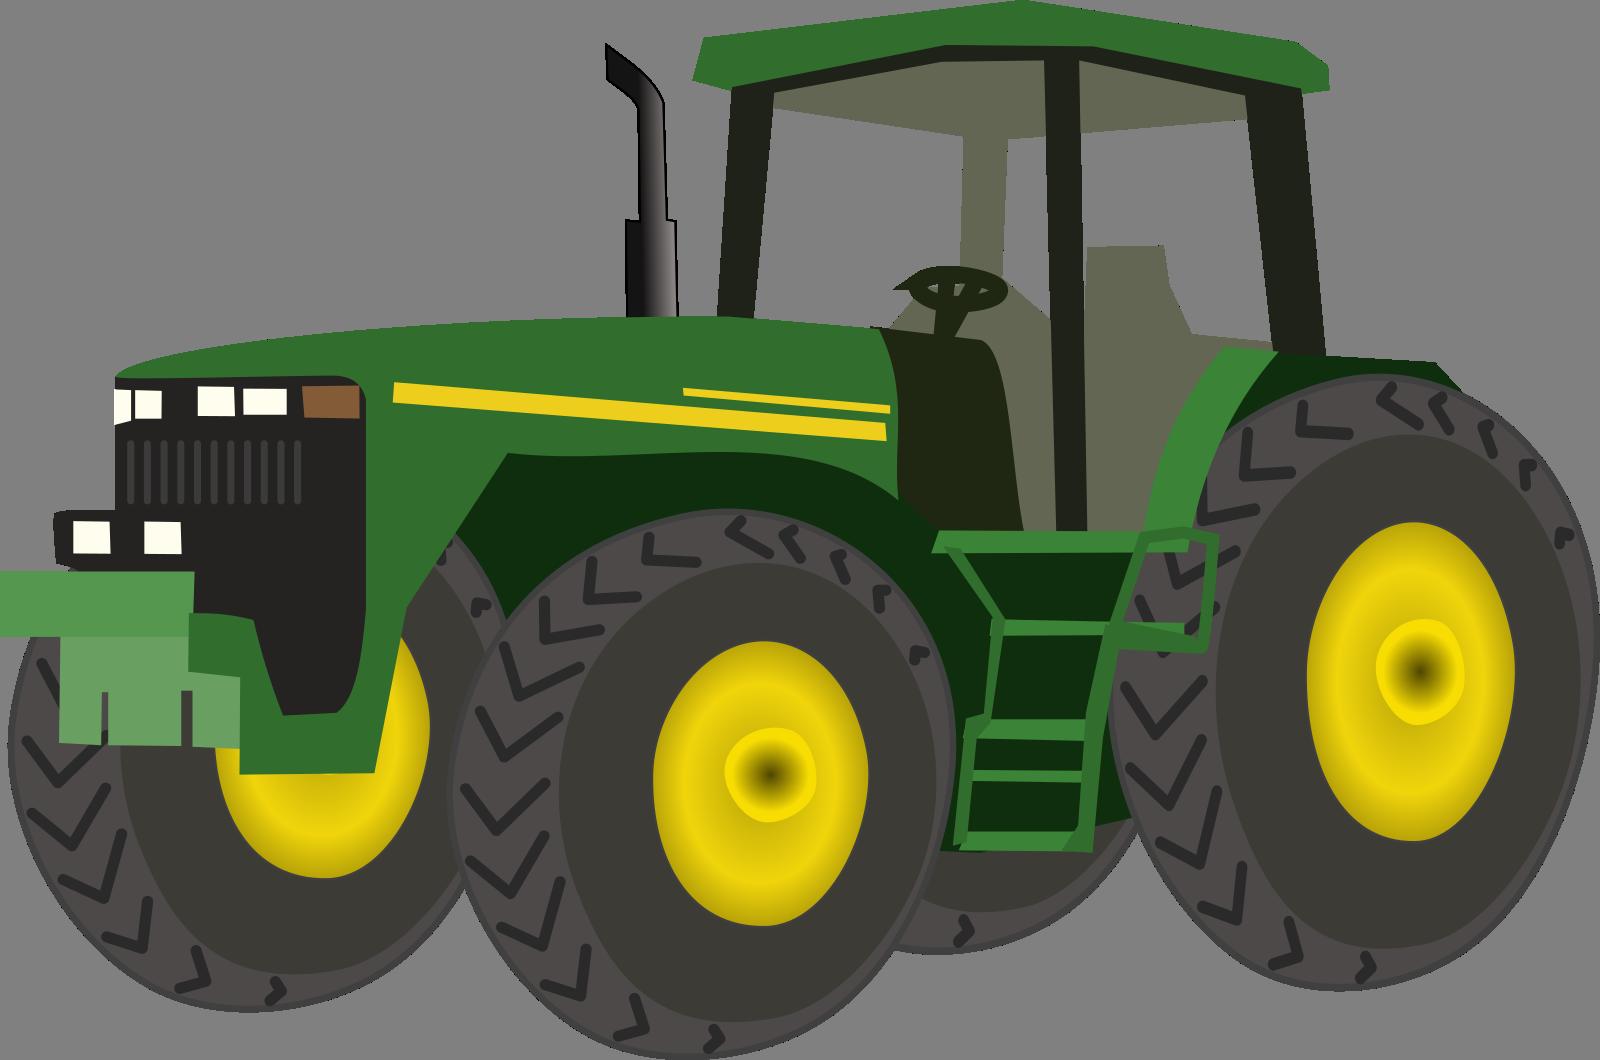 Obrazek Klipart Traktor Zdarma Ke Stazeni V Rozliseni 1600x1060 Px